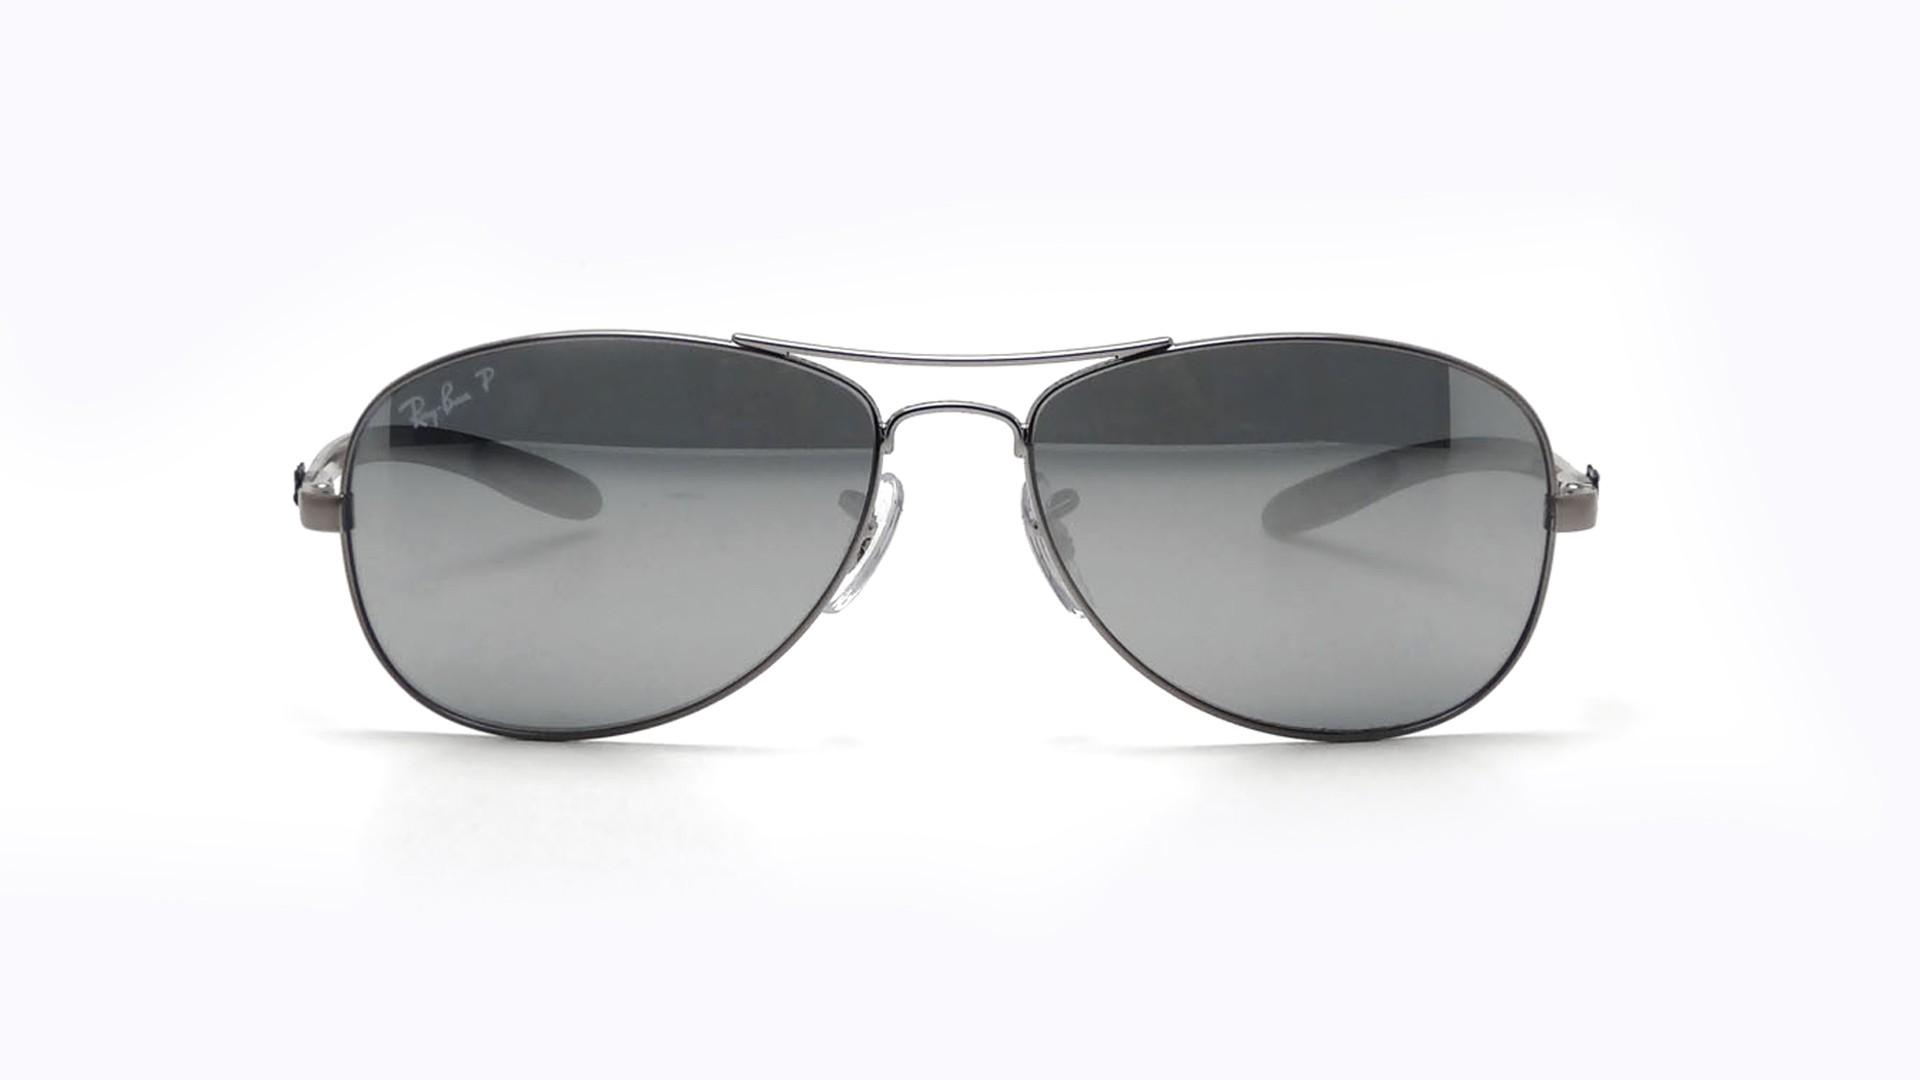 f72396ce7d5 Sunglasses Ray-Ban Fibre Carbon Grey RB8301 004 K6 56-14 Medium Polarized  Mirror